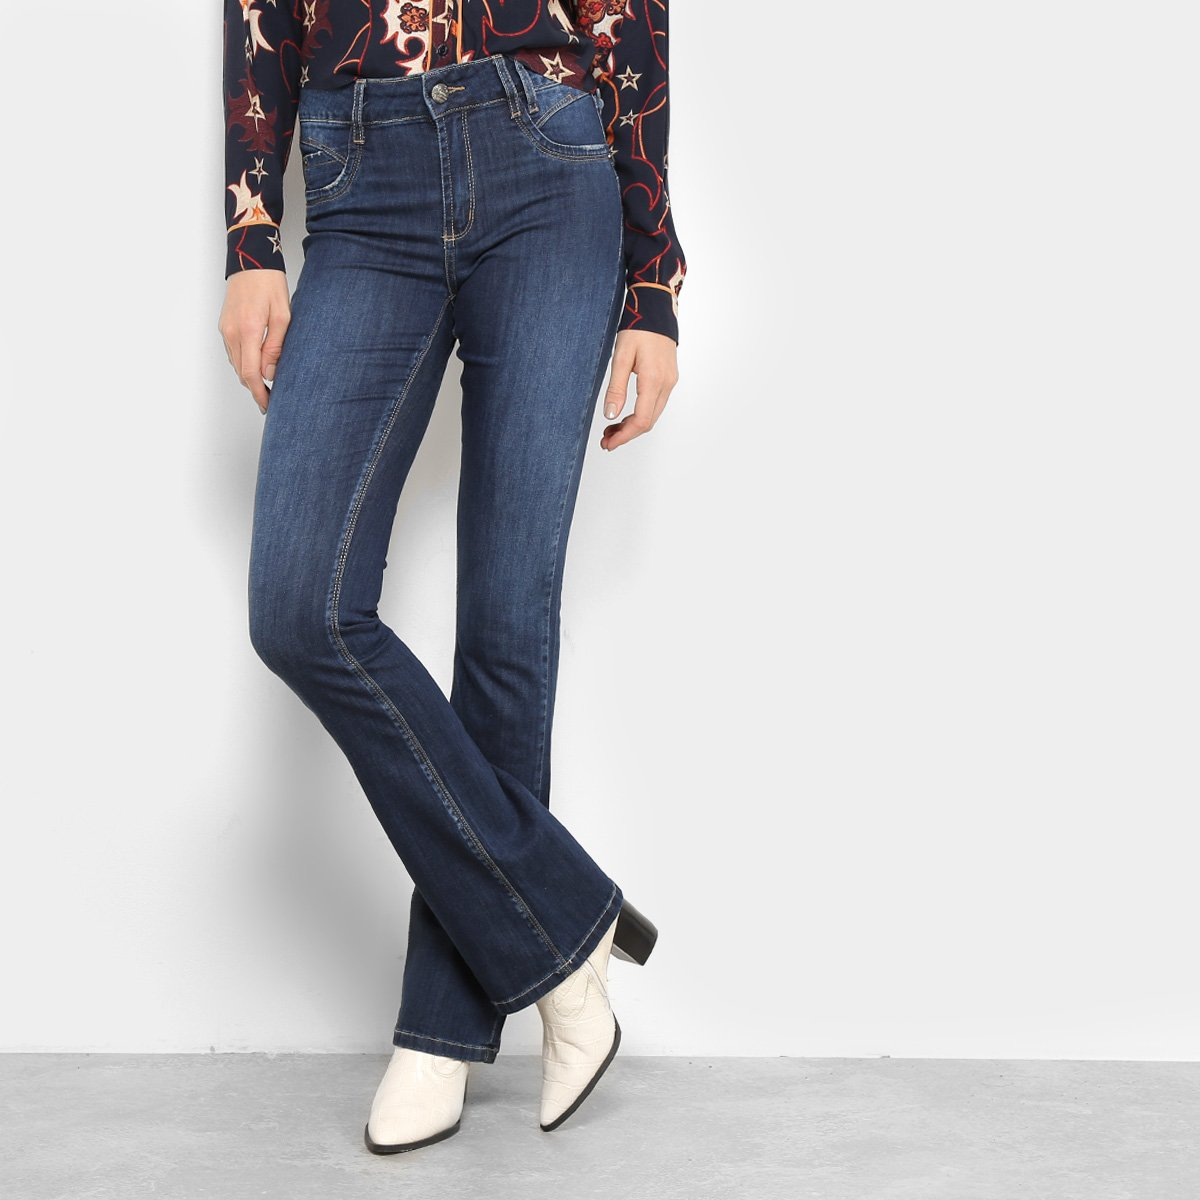 6e5337ad4 Calça Jeans Flare Sawary Levanta Bum Bum Estonada Cintura Média Feminina